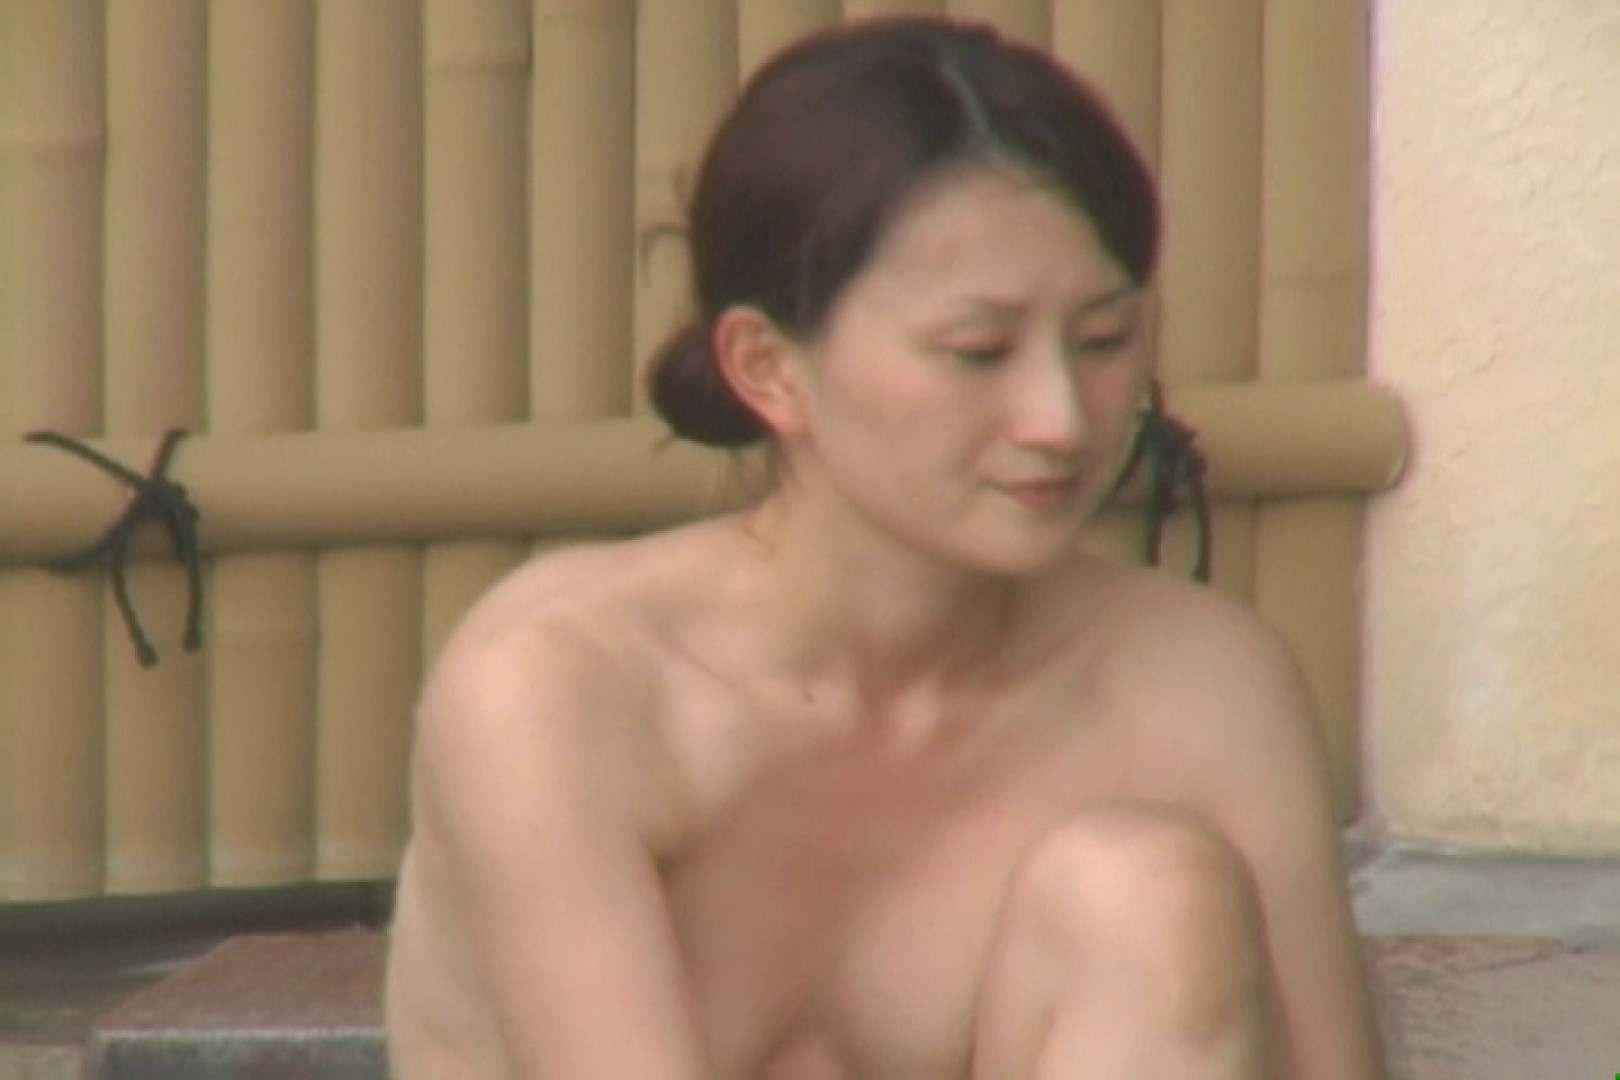 Aquaな露天風呂Vol.578 OLのプライベート  10pic 6